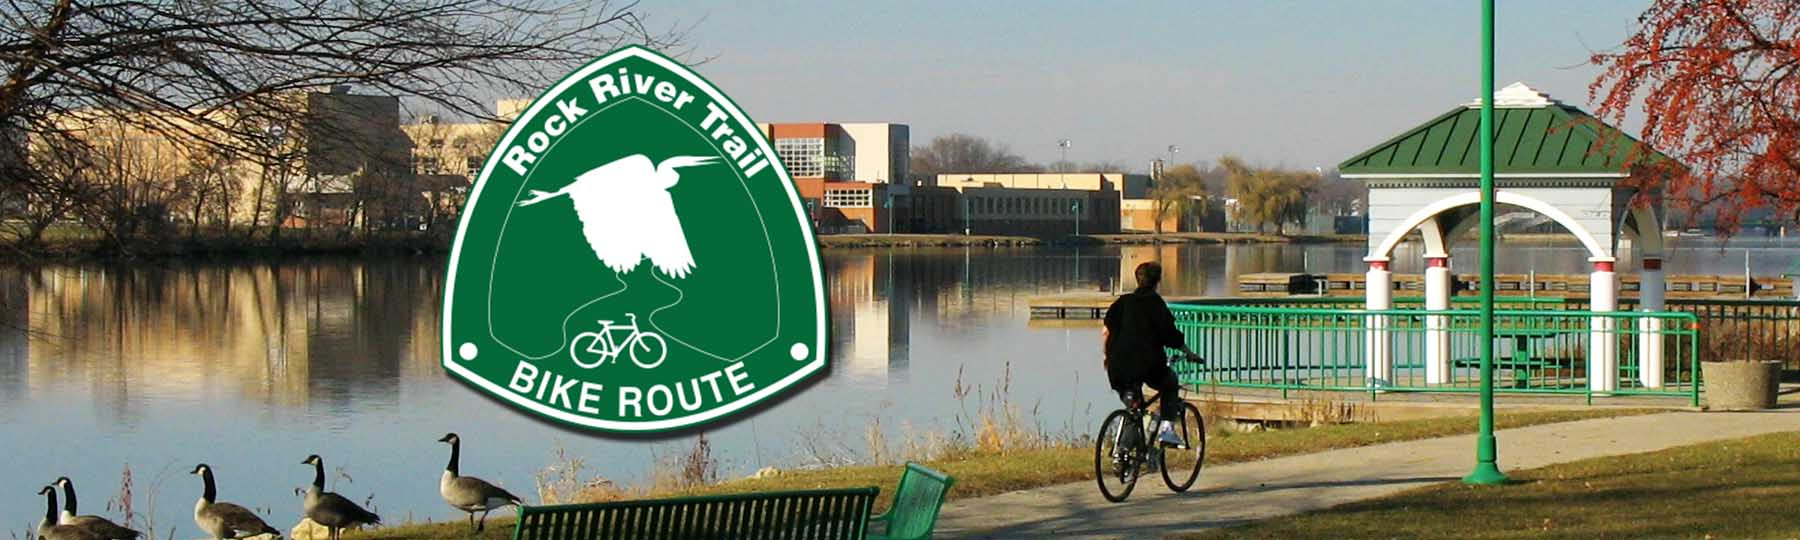 rock river trail wisconsin illinois bike route